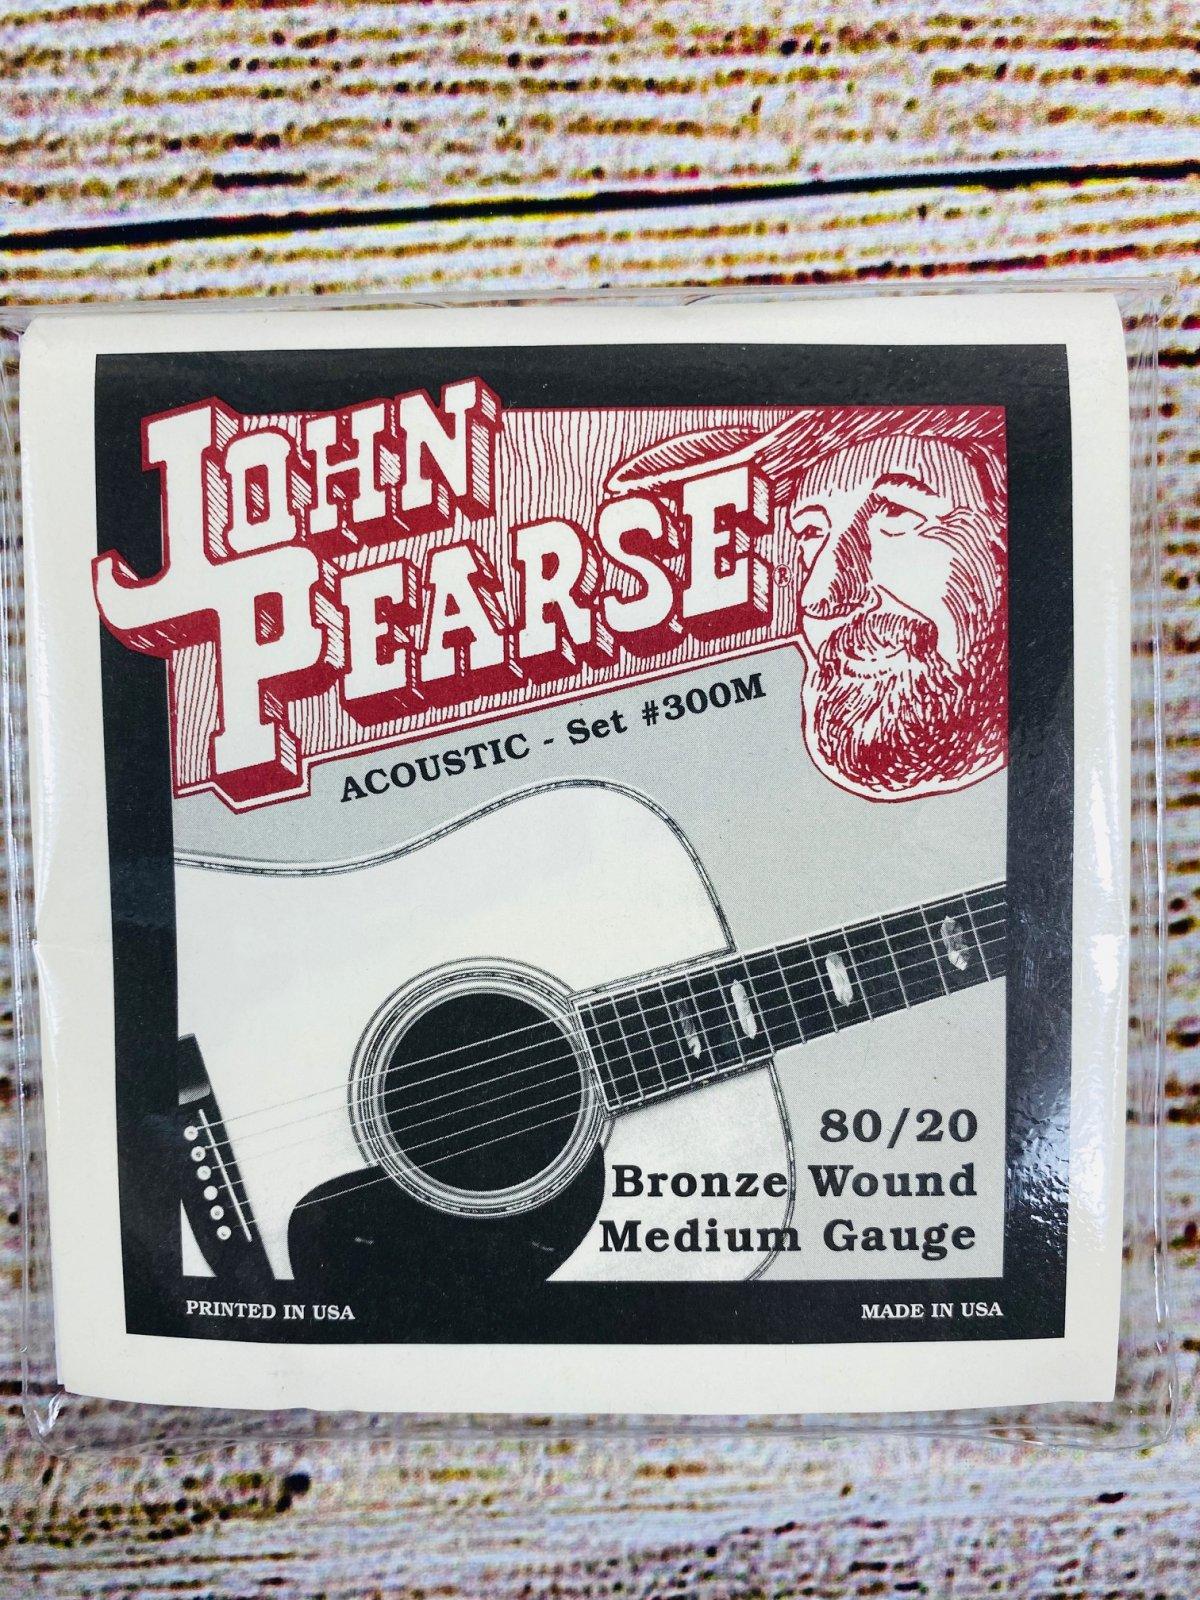 John Pearse Acoustic Six String Guitar 80/20 Bronze Medium Gauge, .013 - .056